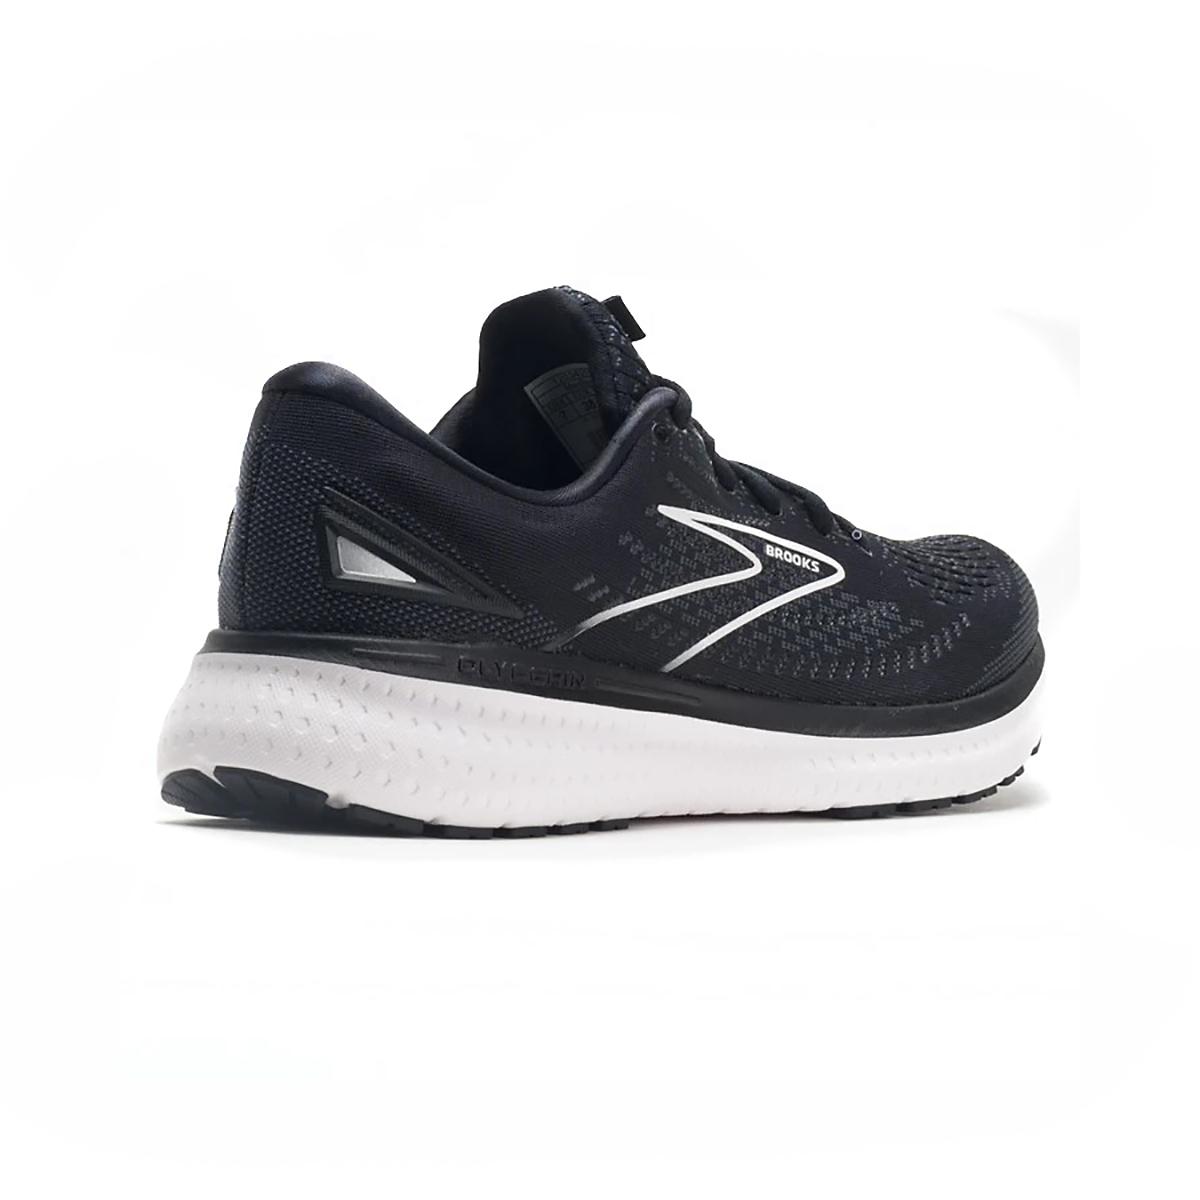 Women's Brooks Glycerin 19 Running Shoe - Color: Black/White - Size: 5 - Width: Regular, Black/White, large, image 4